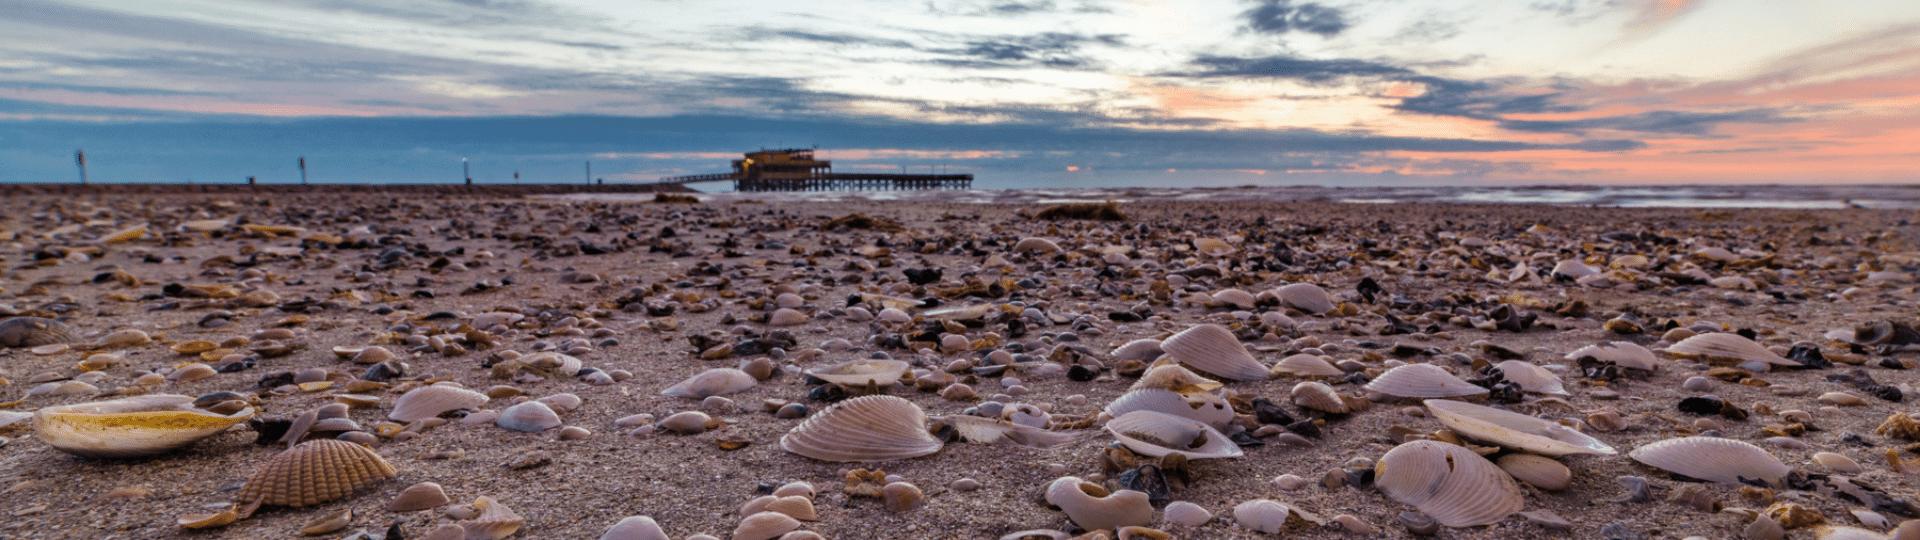 Shells on beach in Galveston TX